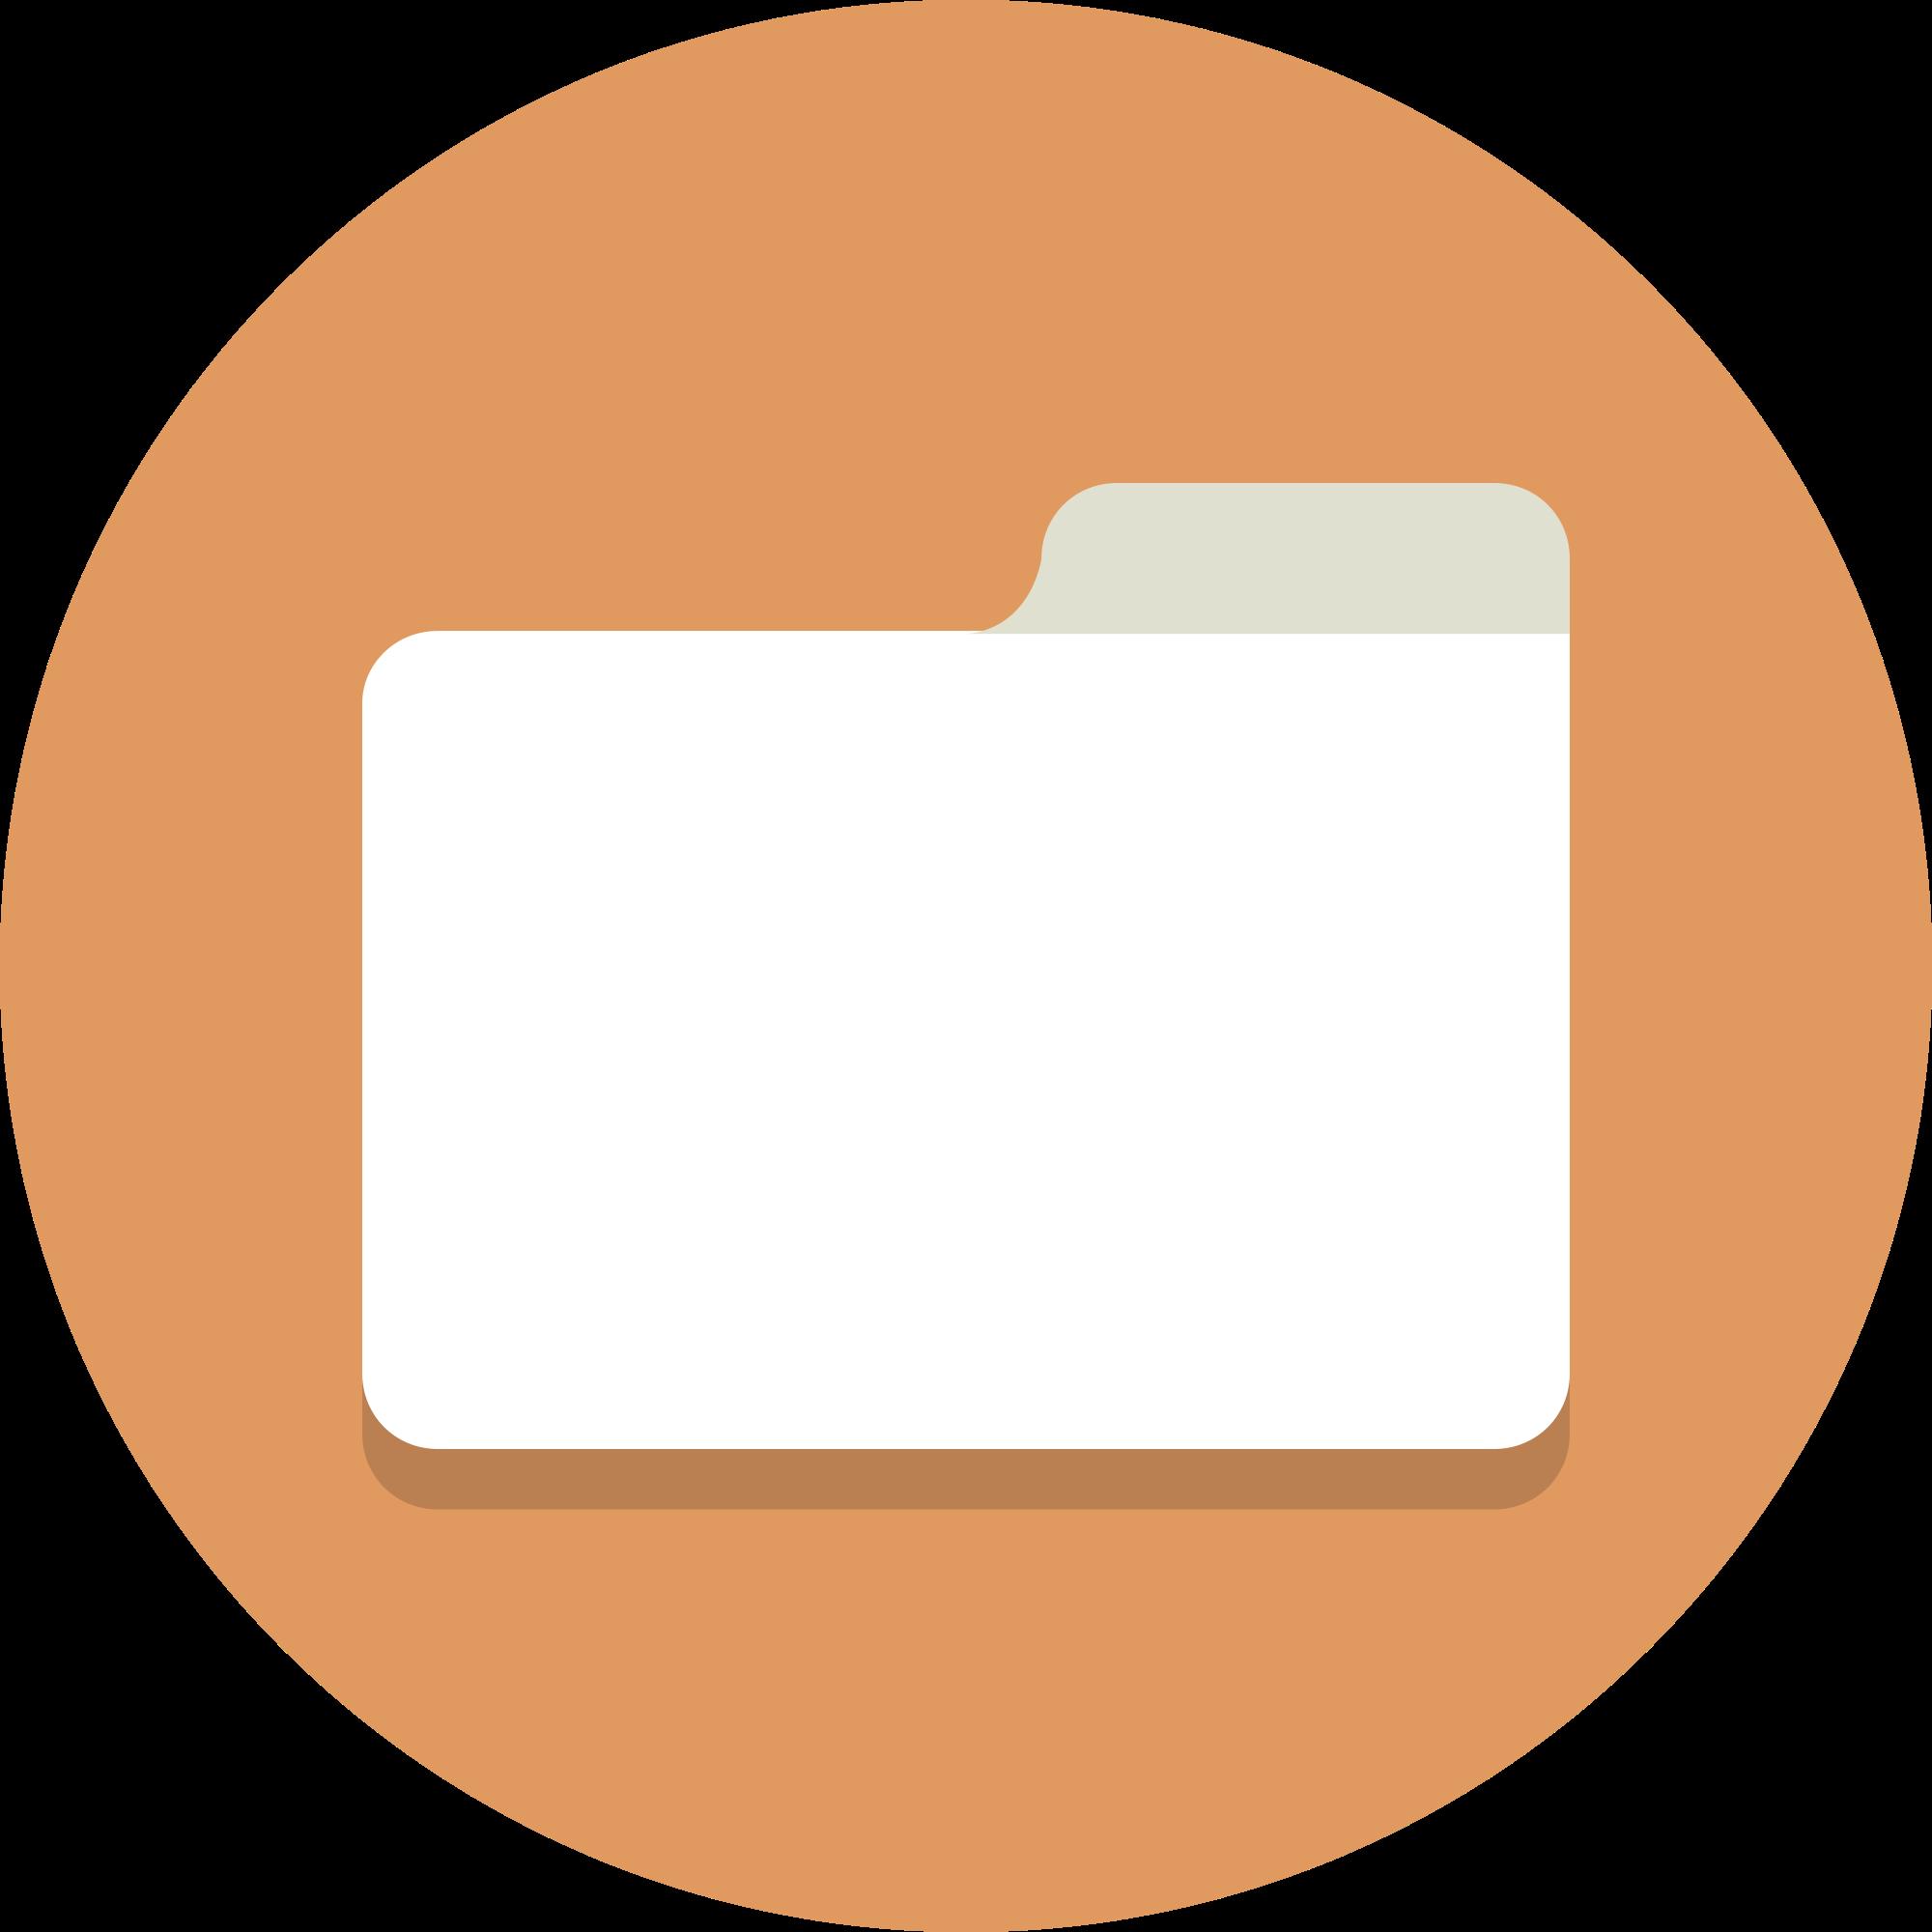 File circle icons svg. Folder clipart flat